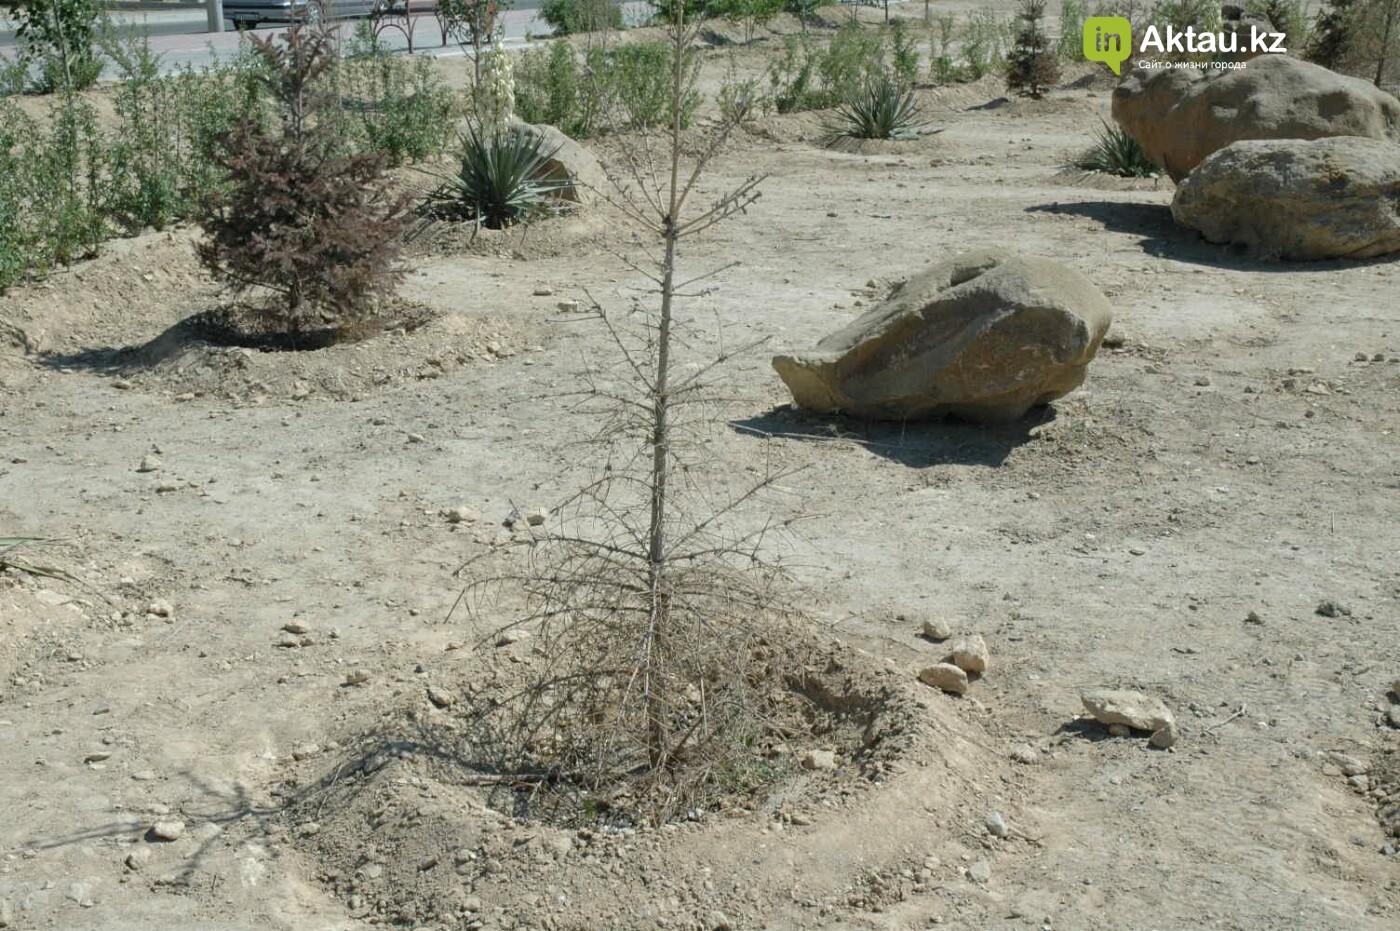 Погибшие от засухи и обезвоживания в Актау исчисляются десятками (ФОТО), фото-31